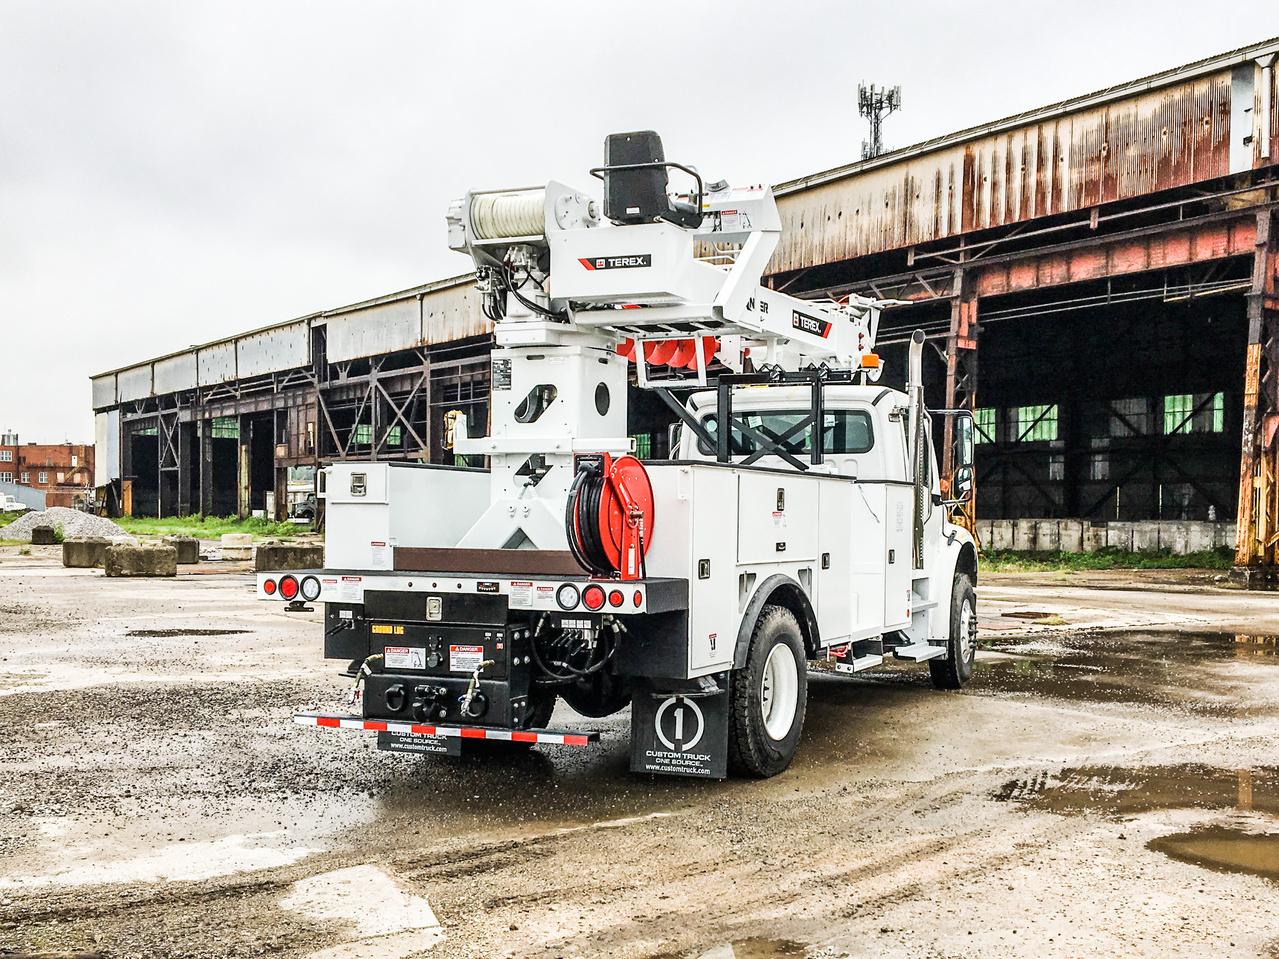 Terex Commander 4047 Digger Derrick on 2020 Freightliner M2106 4x2